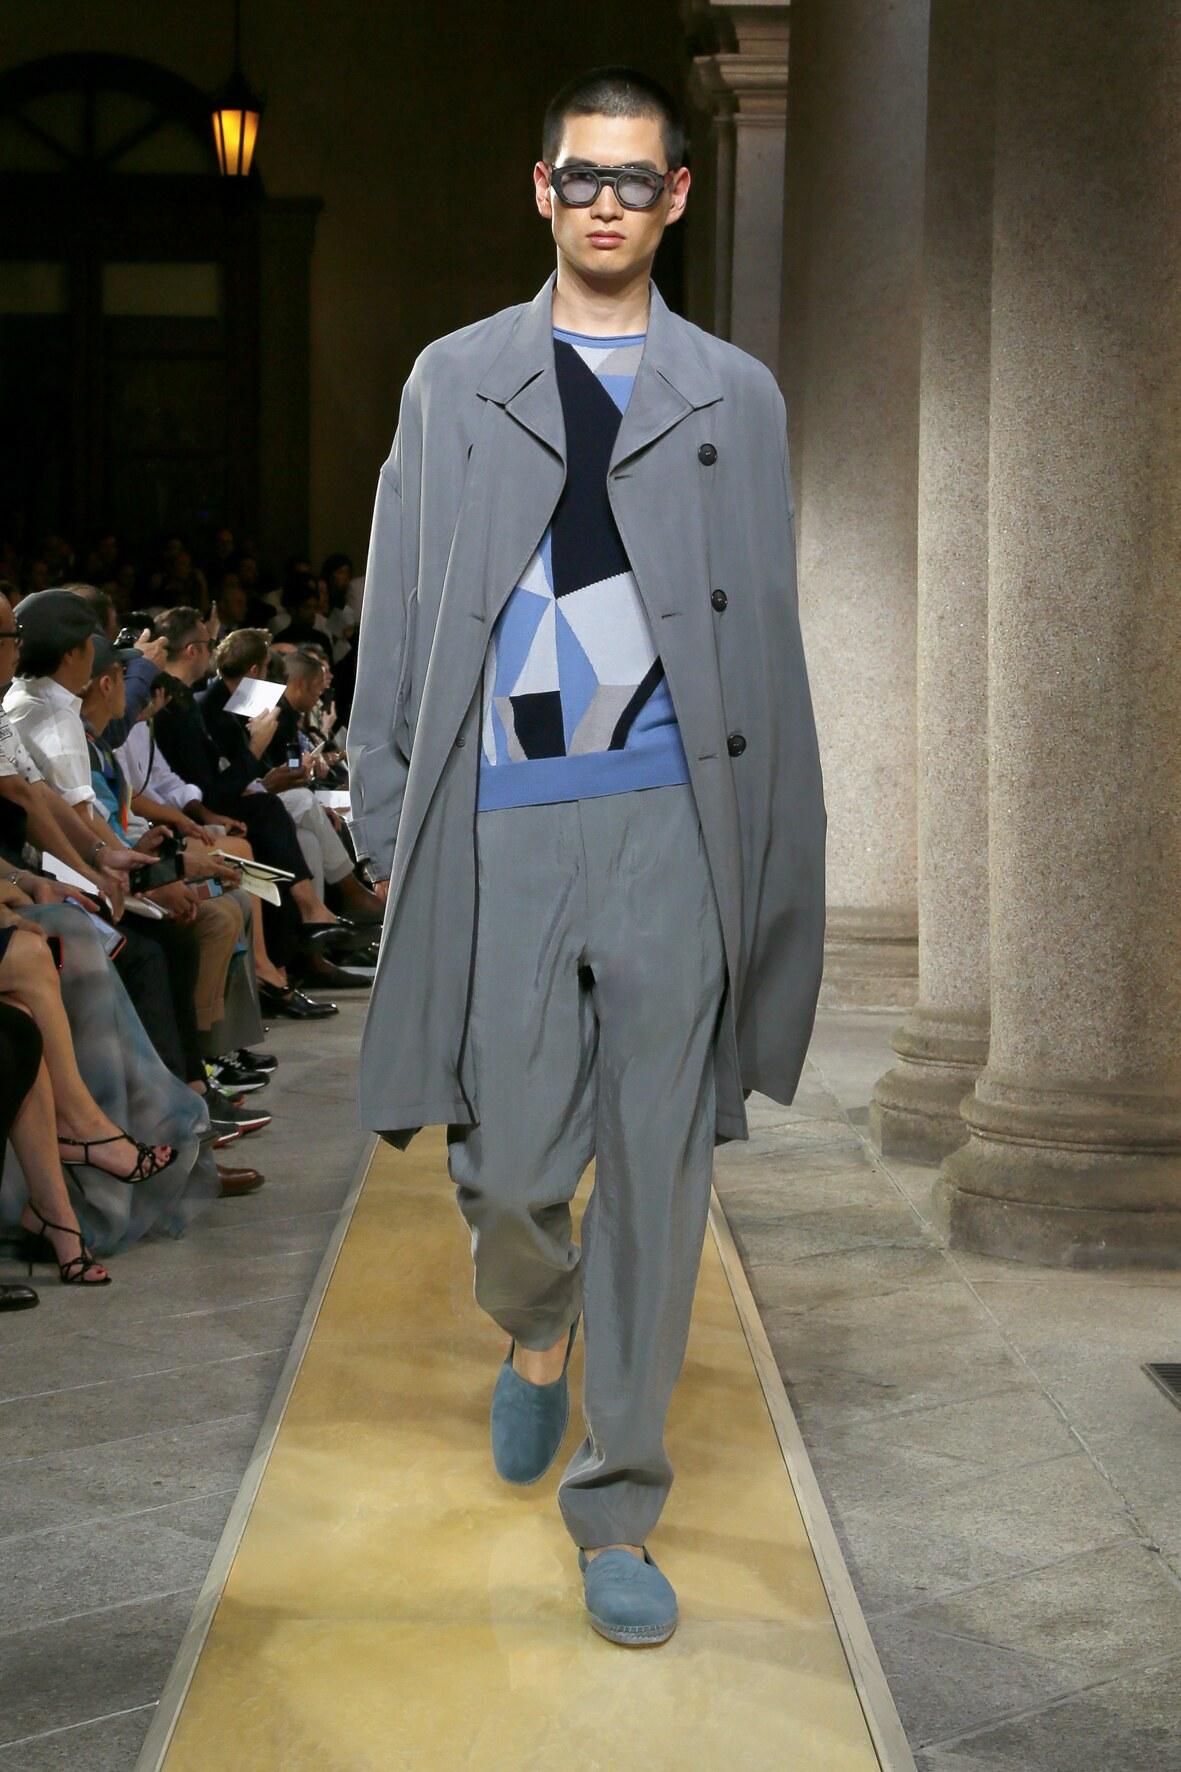 Man SS 2020 Giorgio Armani Show Milan Fashion Week